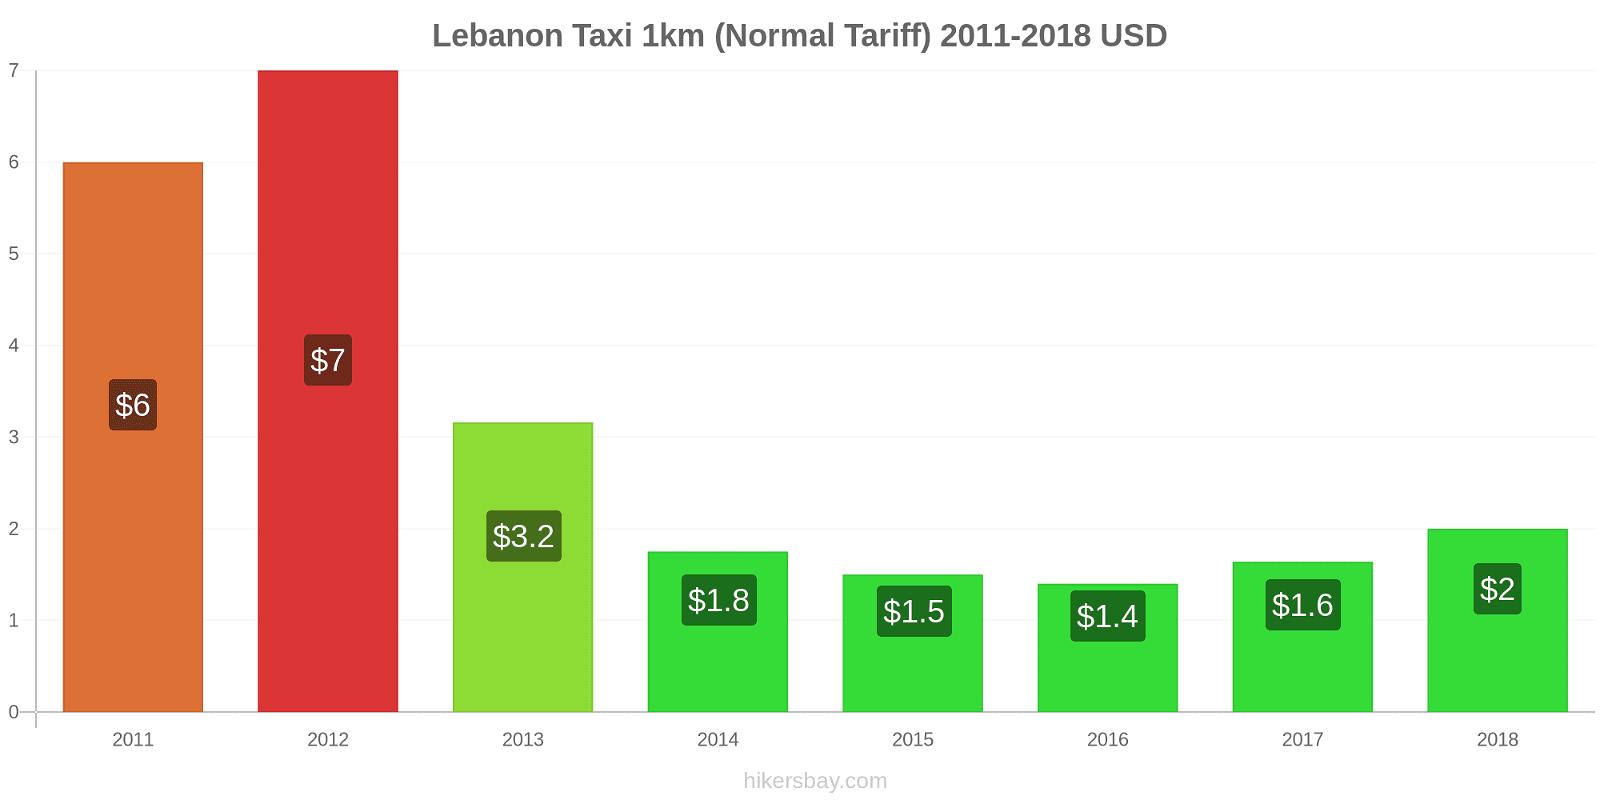 Lebanon price changes Taxi 1km (Normal Tariff) hikersbay.com